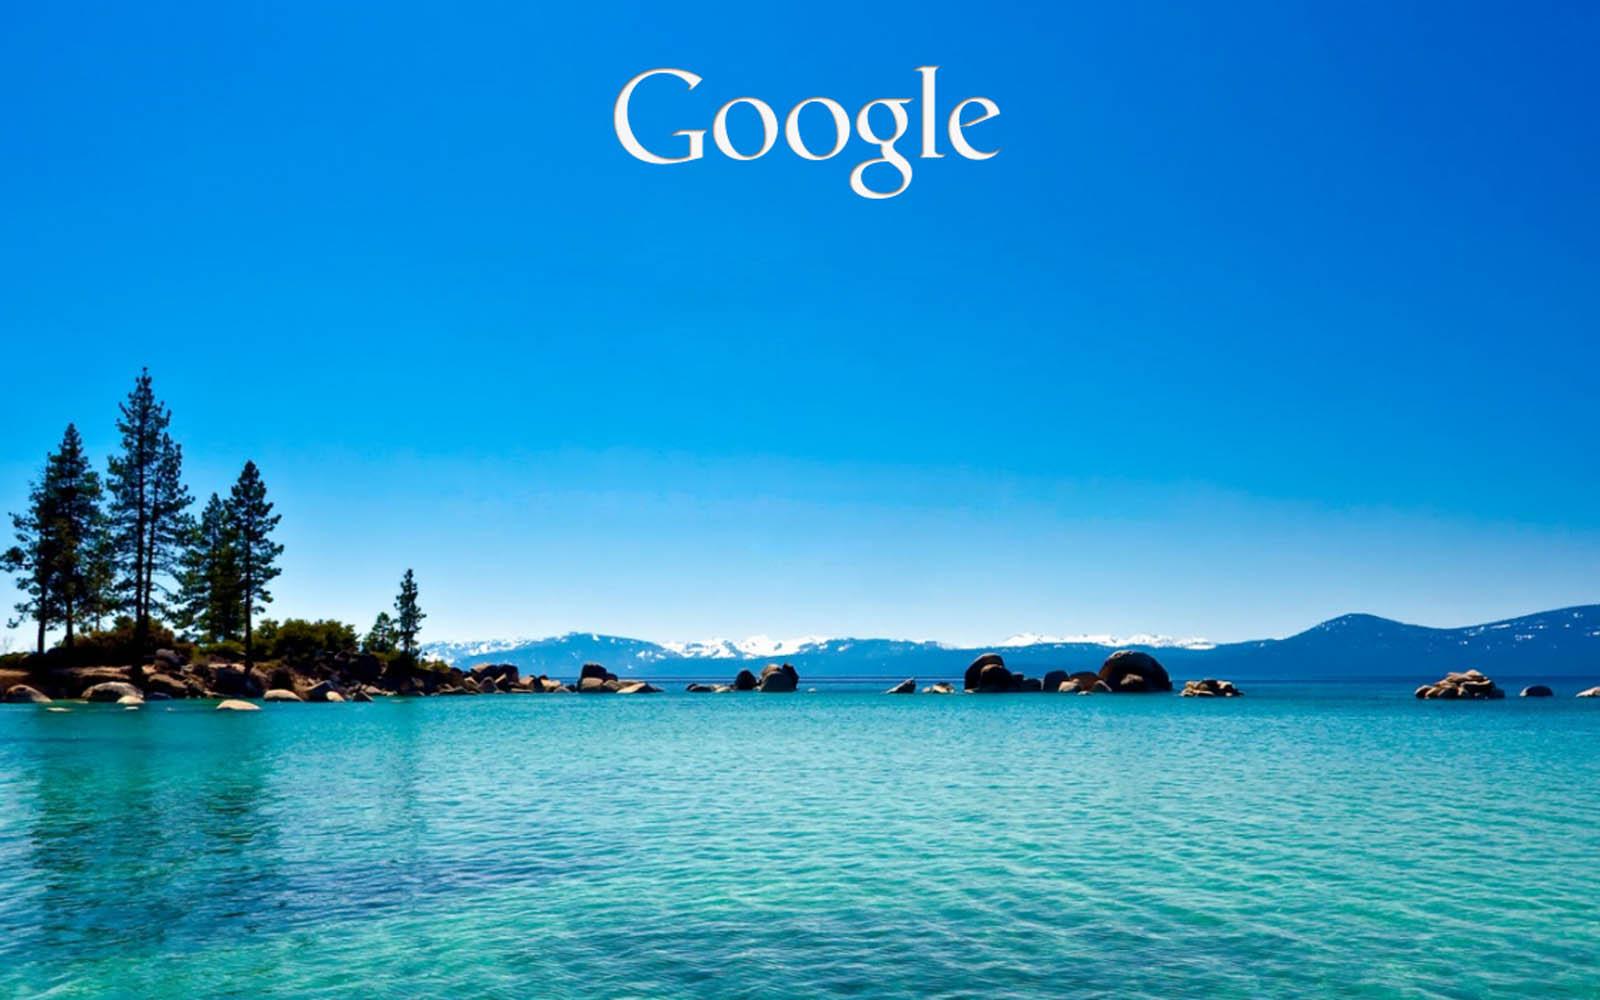 google winter screensavers and wallpaper - photo #48